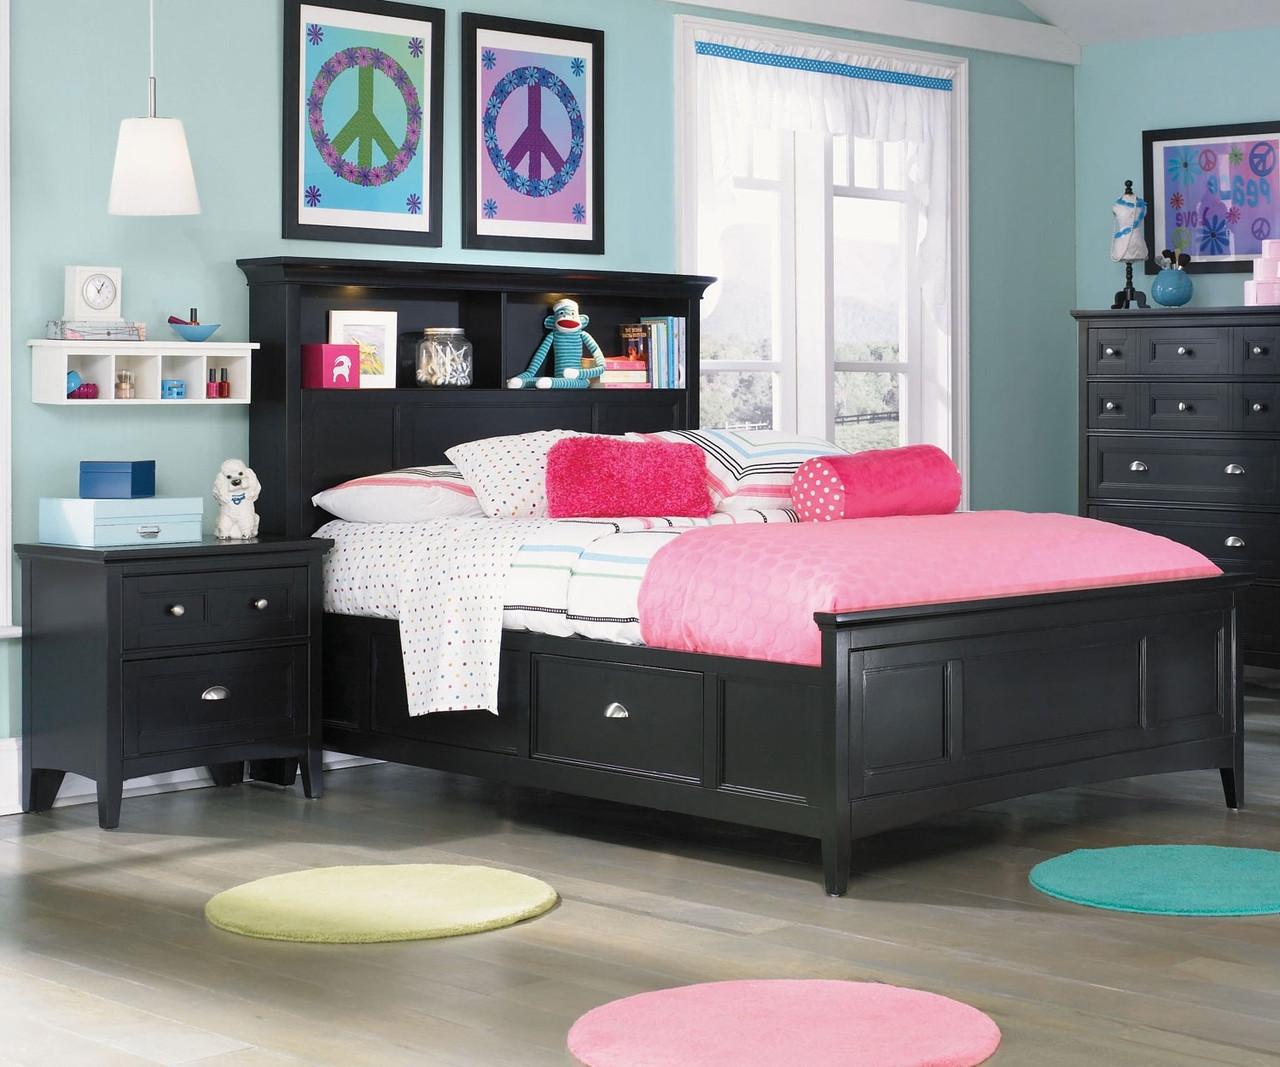 Bennett Twin Size Bookcase Bed With Storage Y1874 58 Magnussen